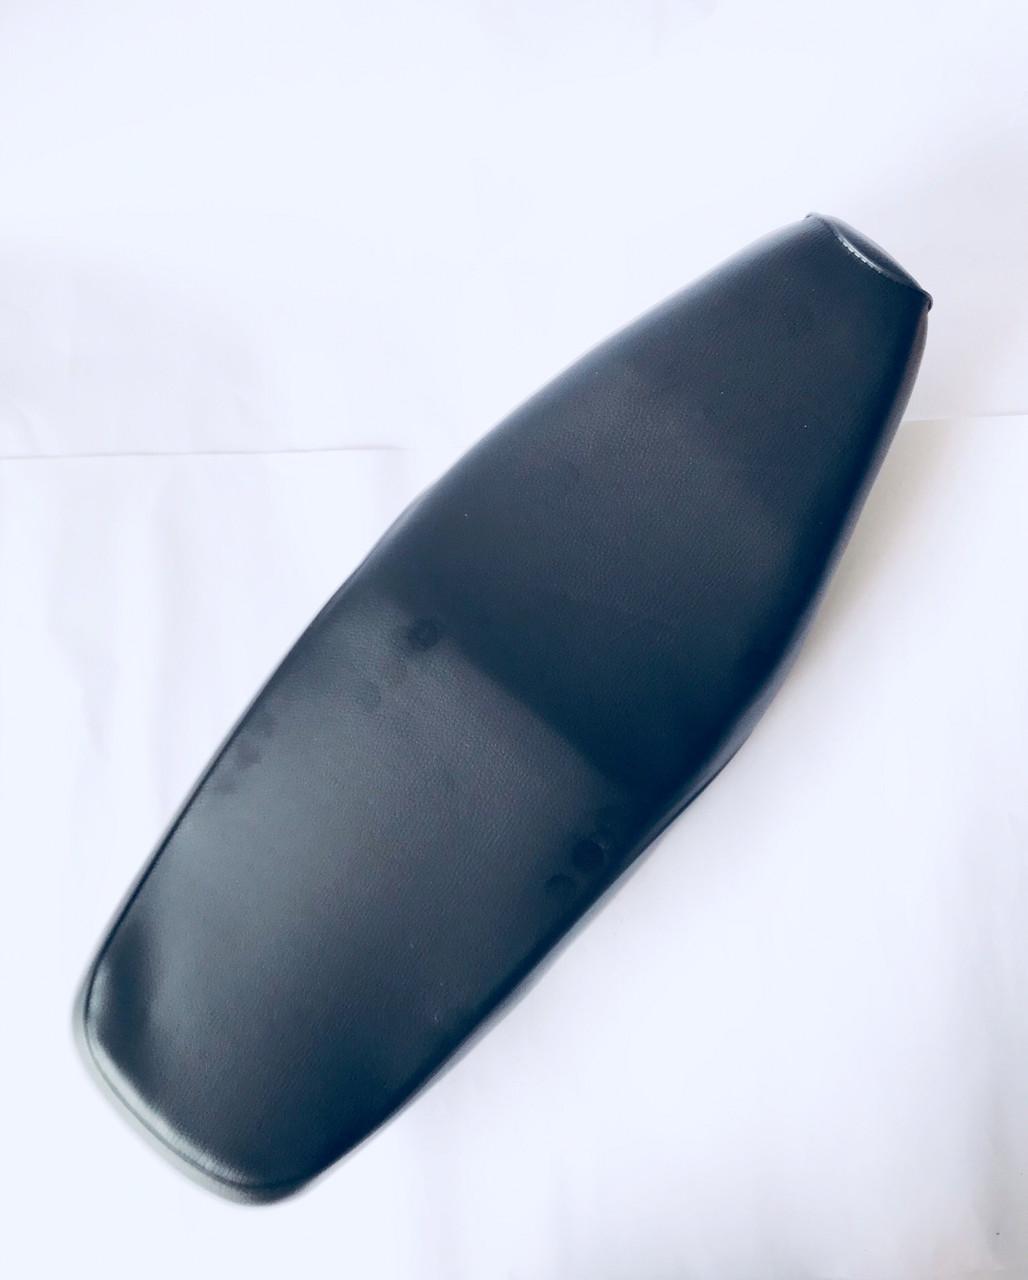 Седло ACTIVE NEW, пластиковая основа